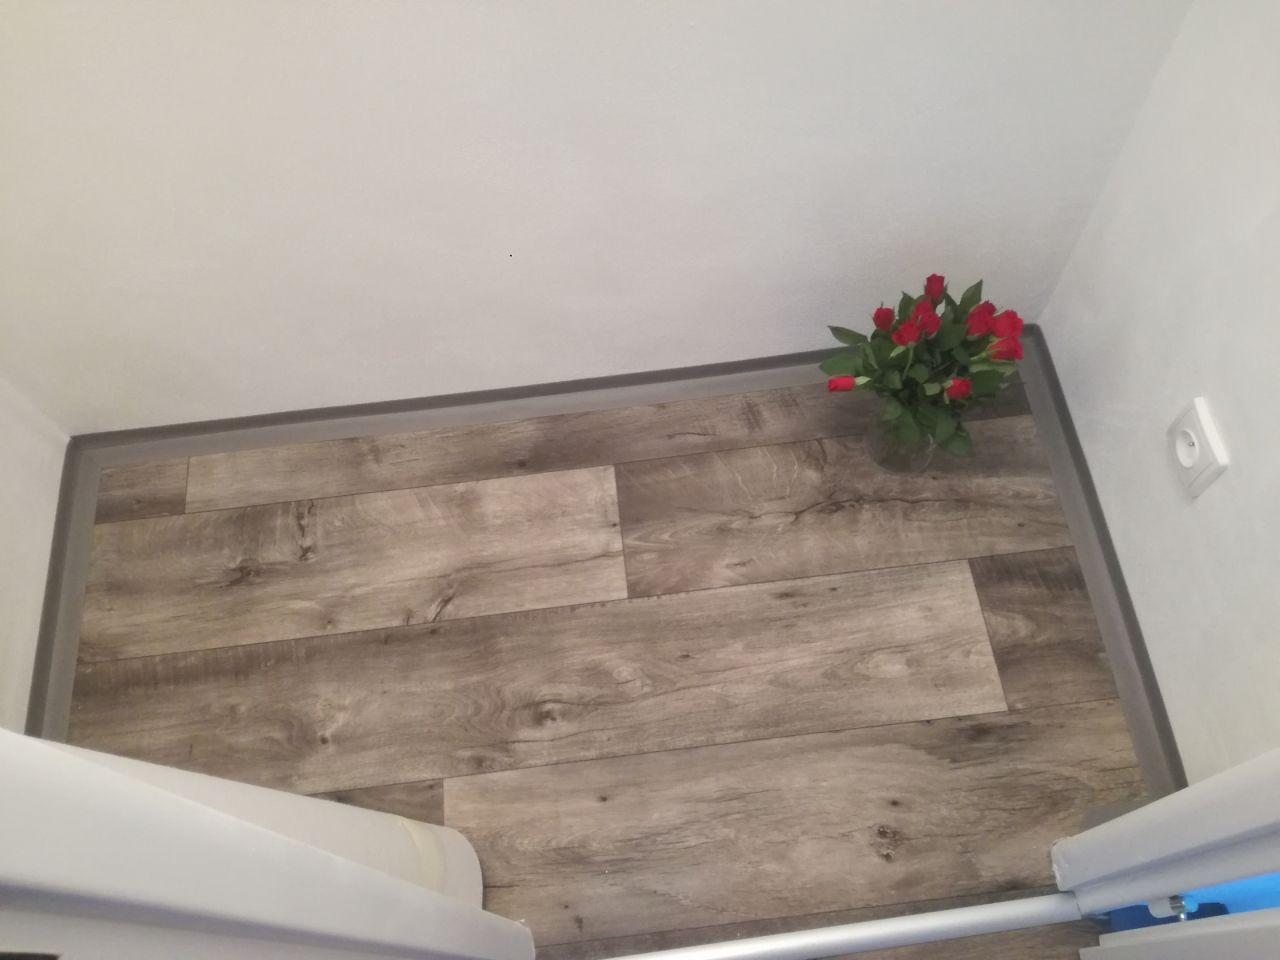 Pronájem bytu 2+1 55 m2, ul. Ahepjukova 2788/2, Ostrava - Fifejdy Komora